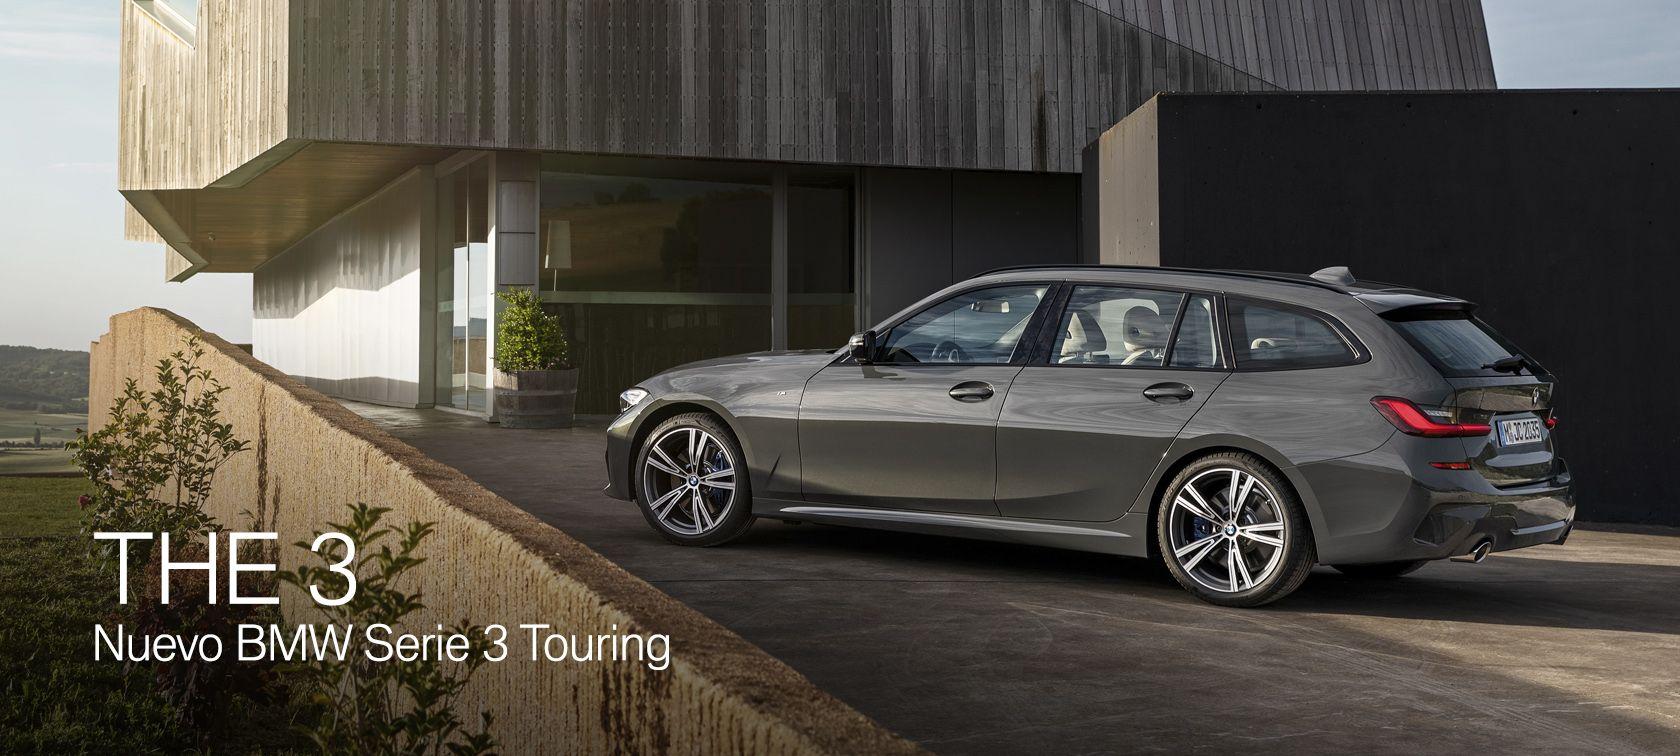 Nuevo BMW Serie 3 Touring.